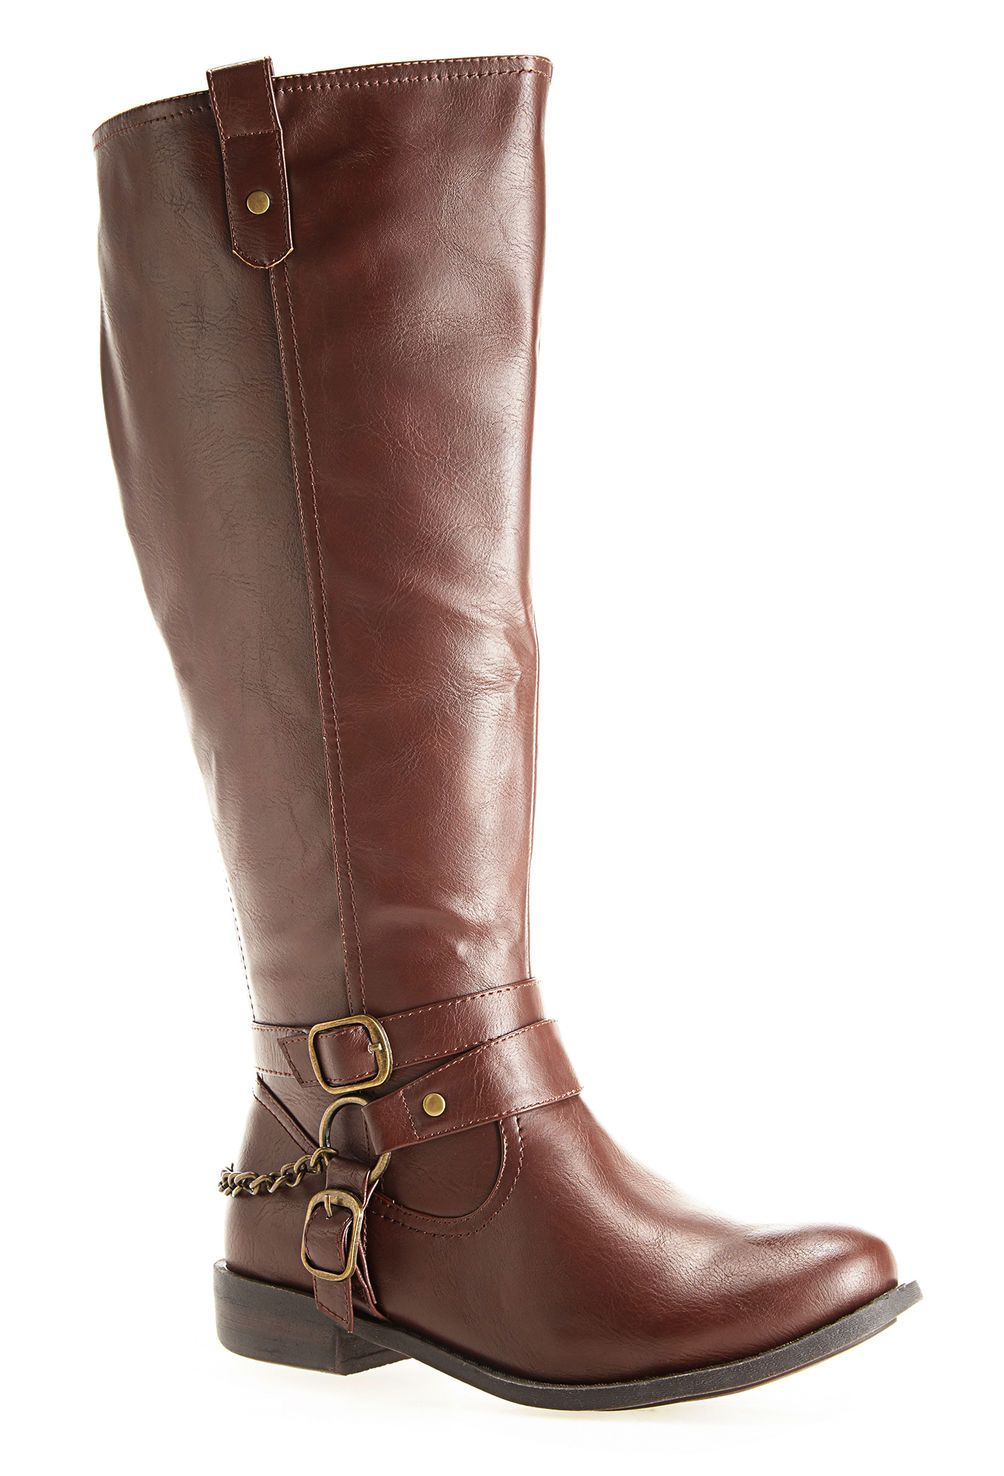 6e3409563bc Savannah Chain Tall Riding Boot-Extra Wide Width Boot-Avenue